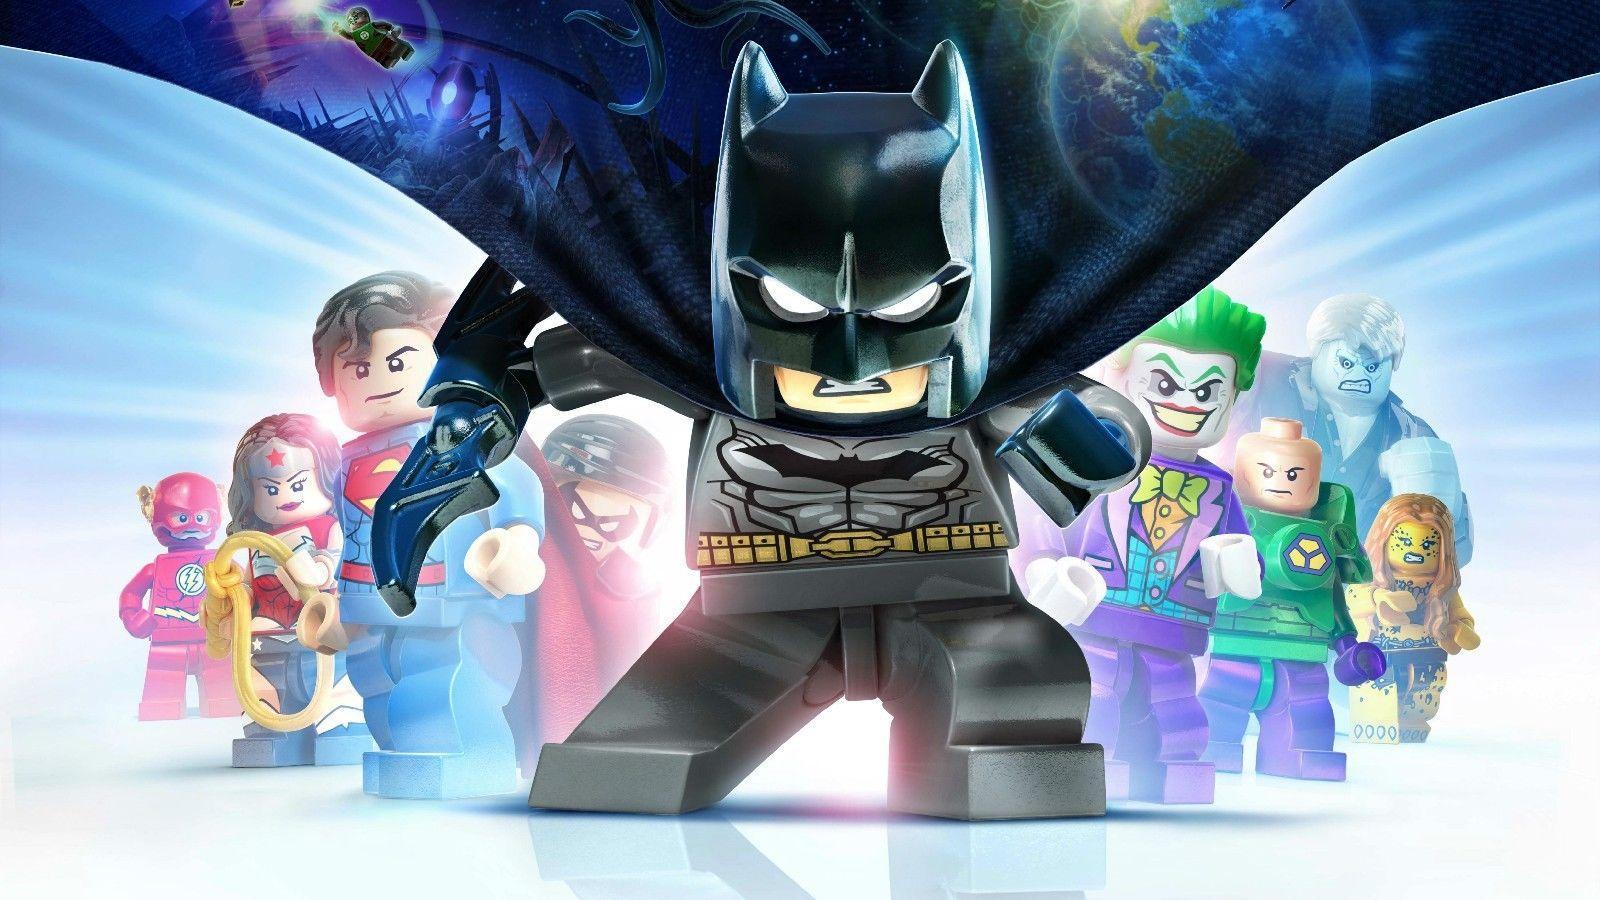 Lego batman oltre gotham Art Silk Poster 20x30 24x36 24x43